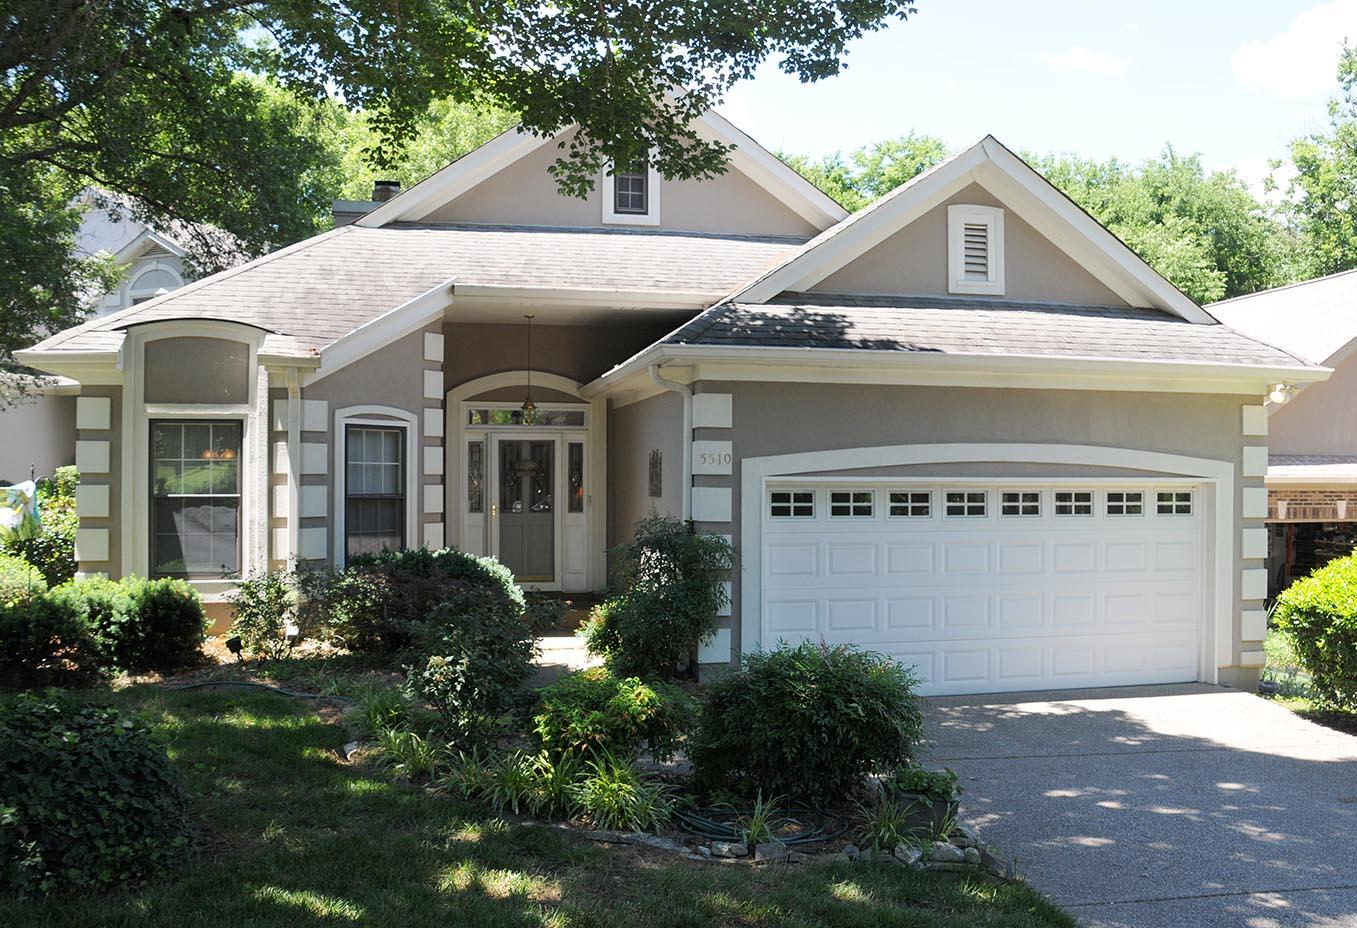 5510 Hearthstone Ln, Brentwood, TN 37027